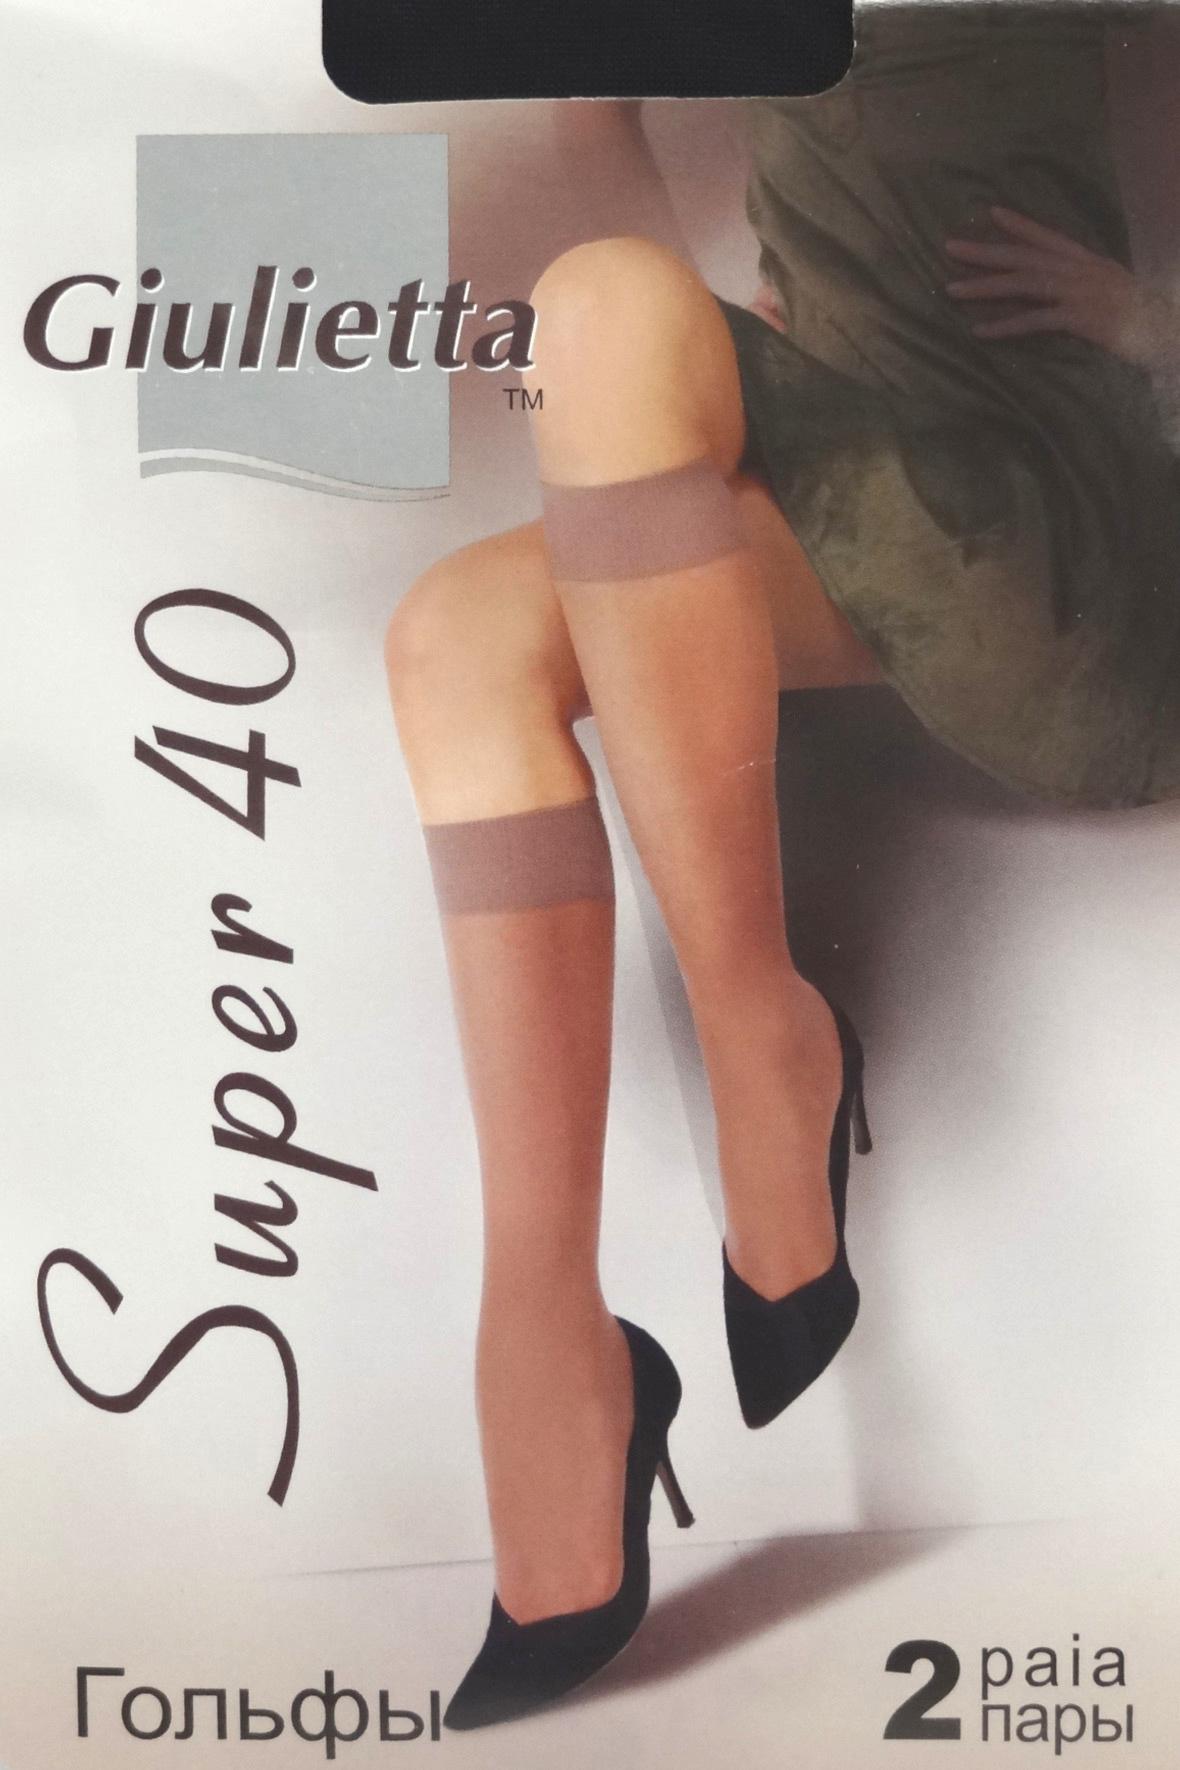 Гольфы Giulietta Super (2 П.) 40